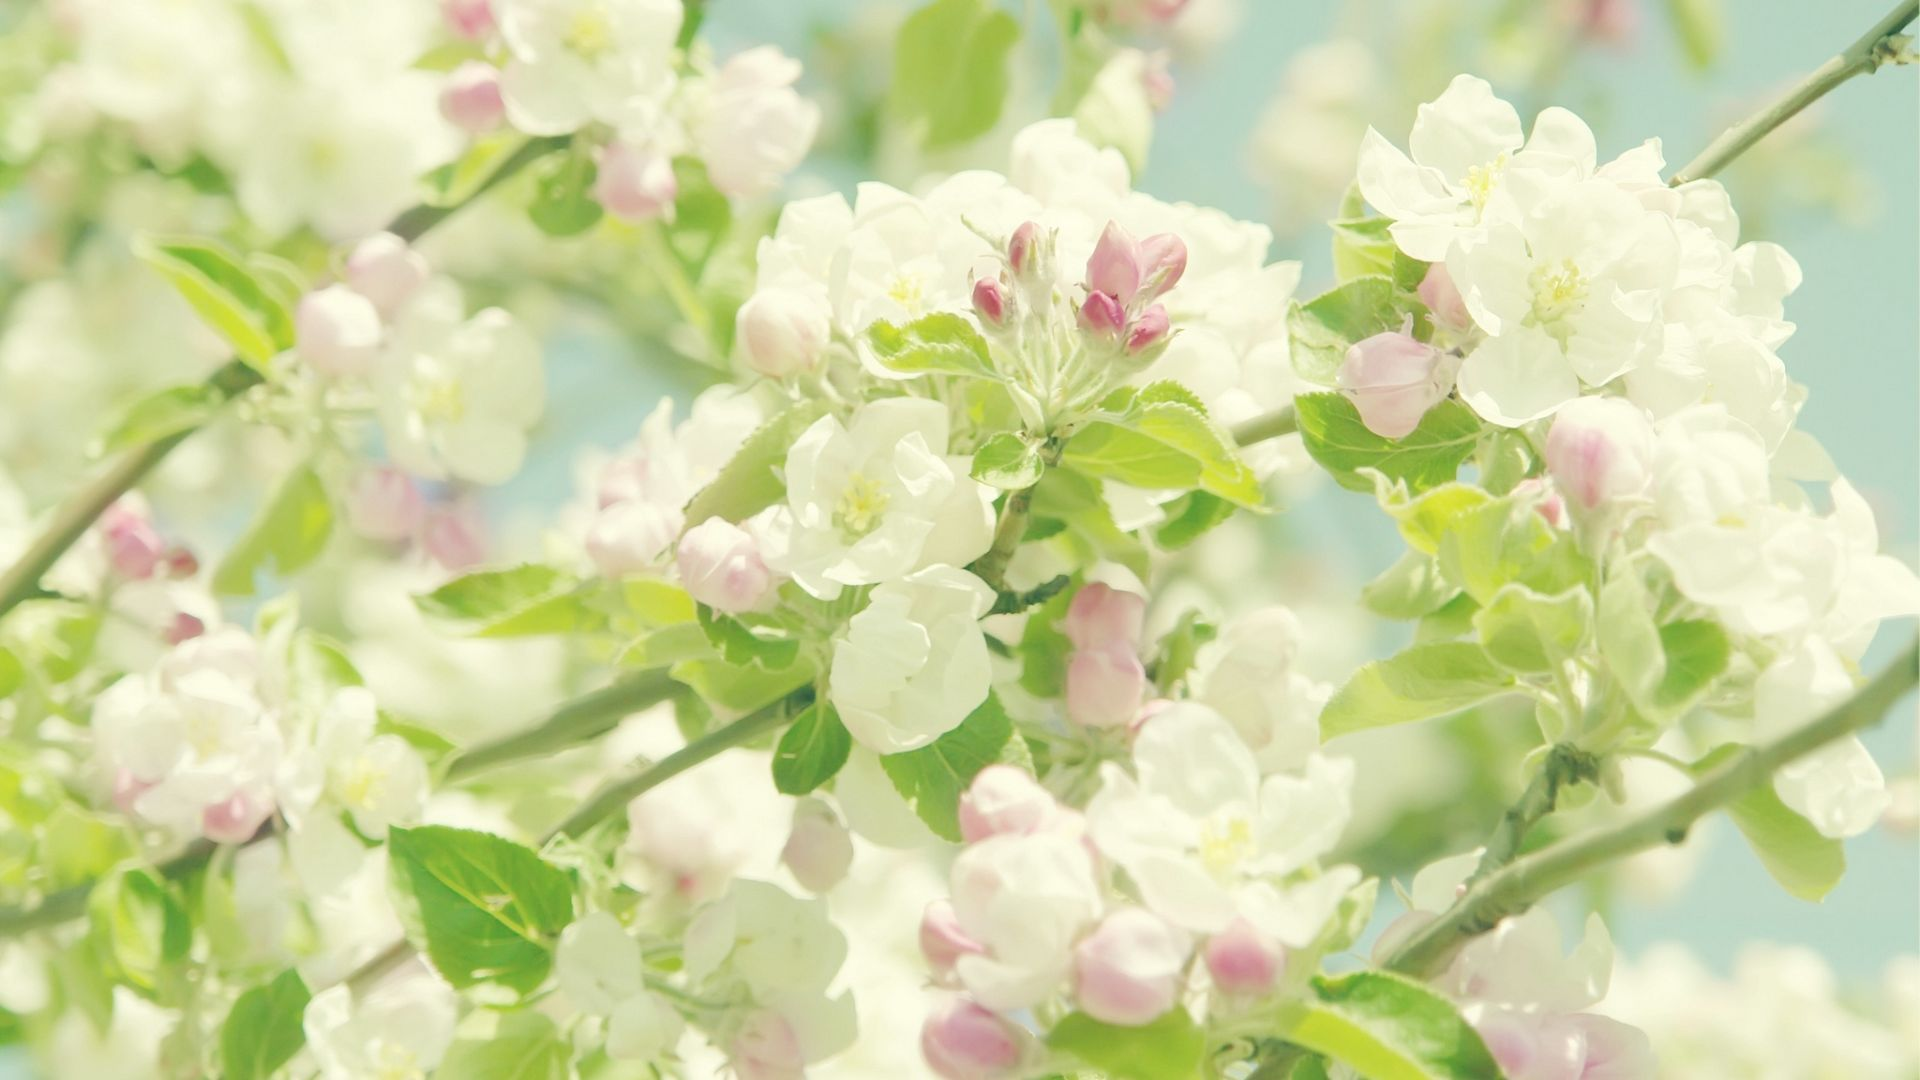 HD spring image